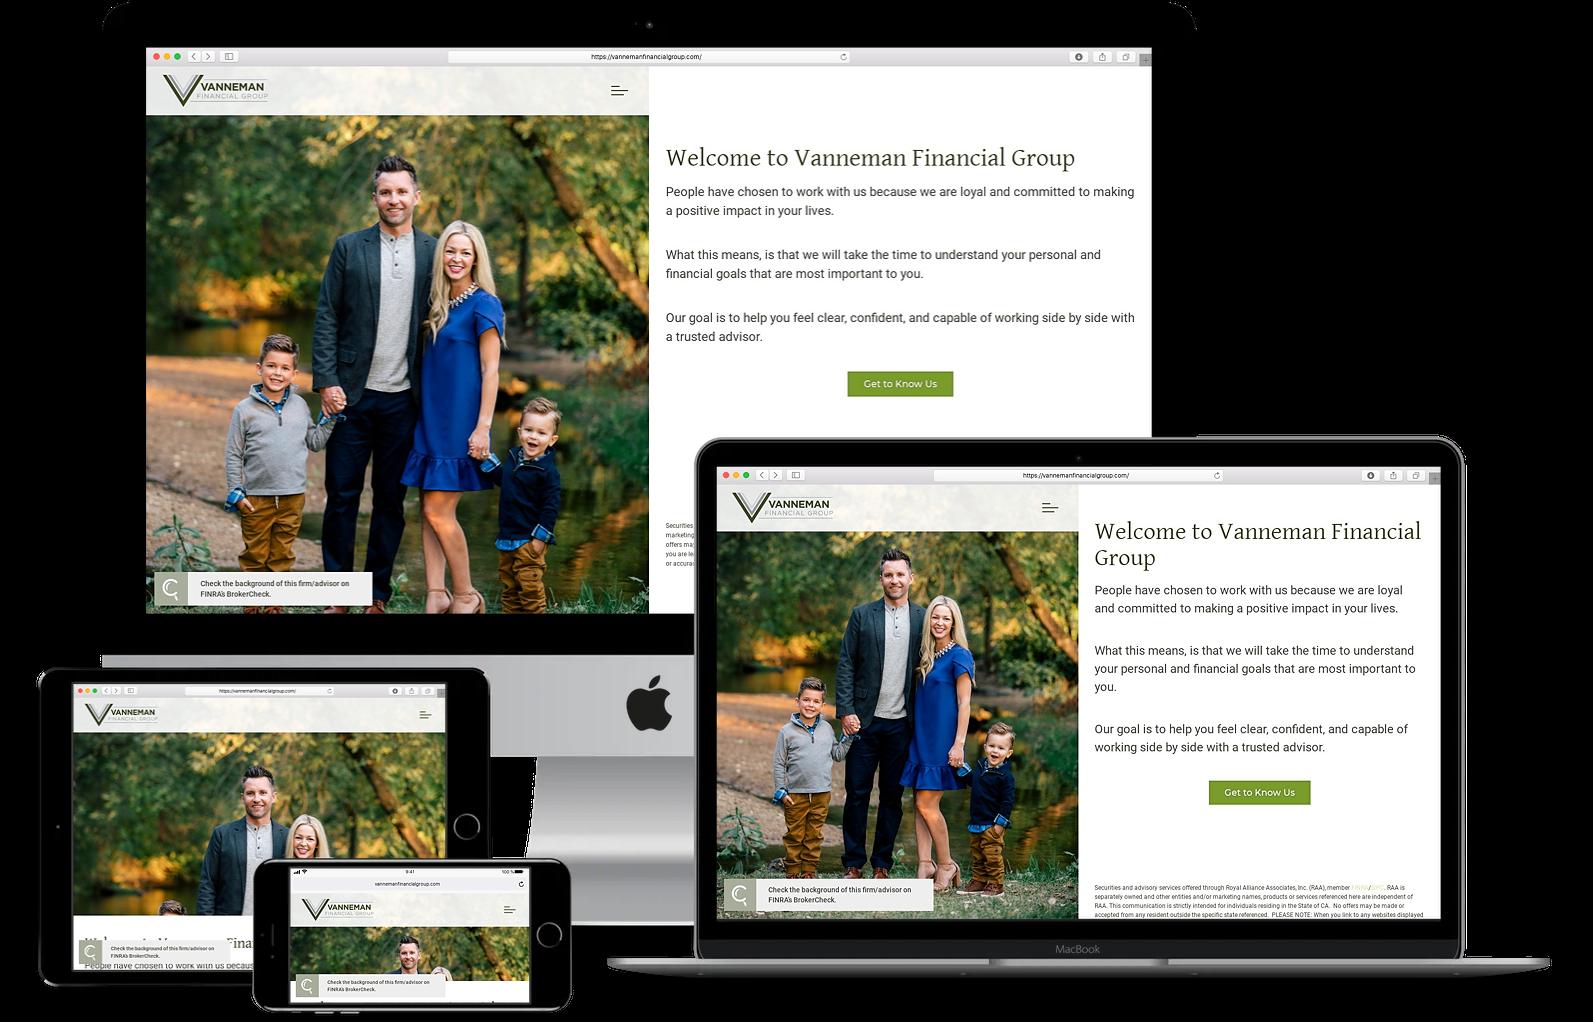 Vanneman Financial Group